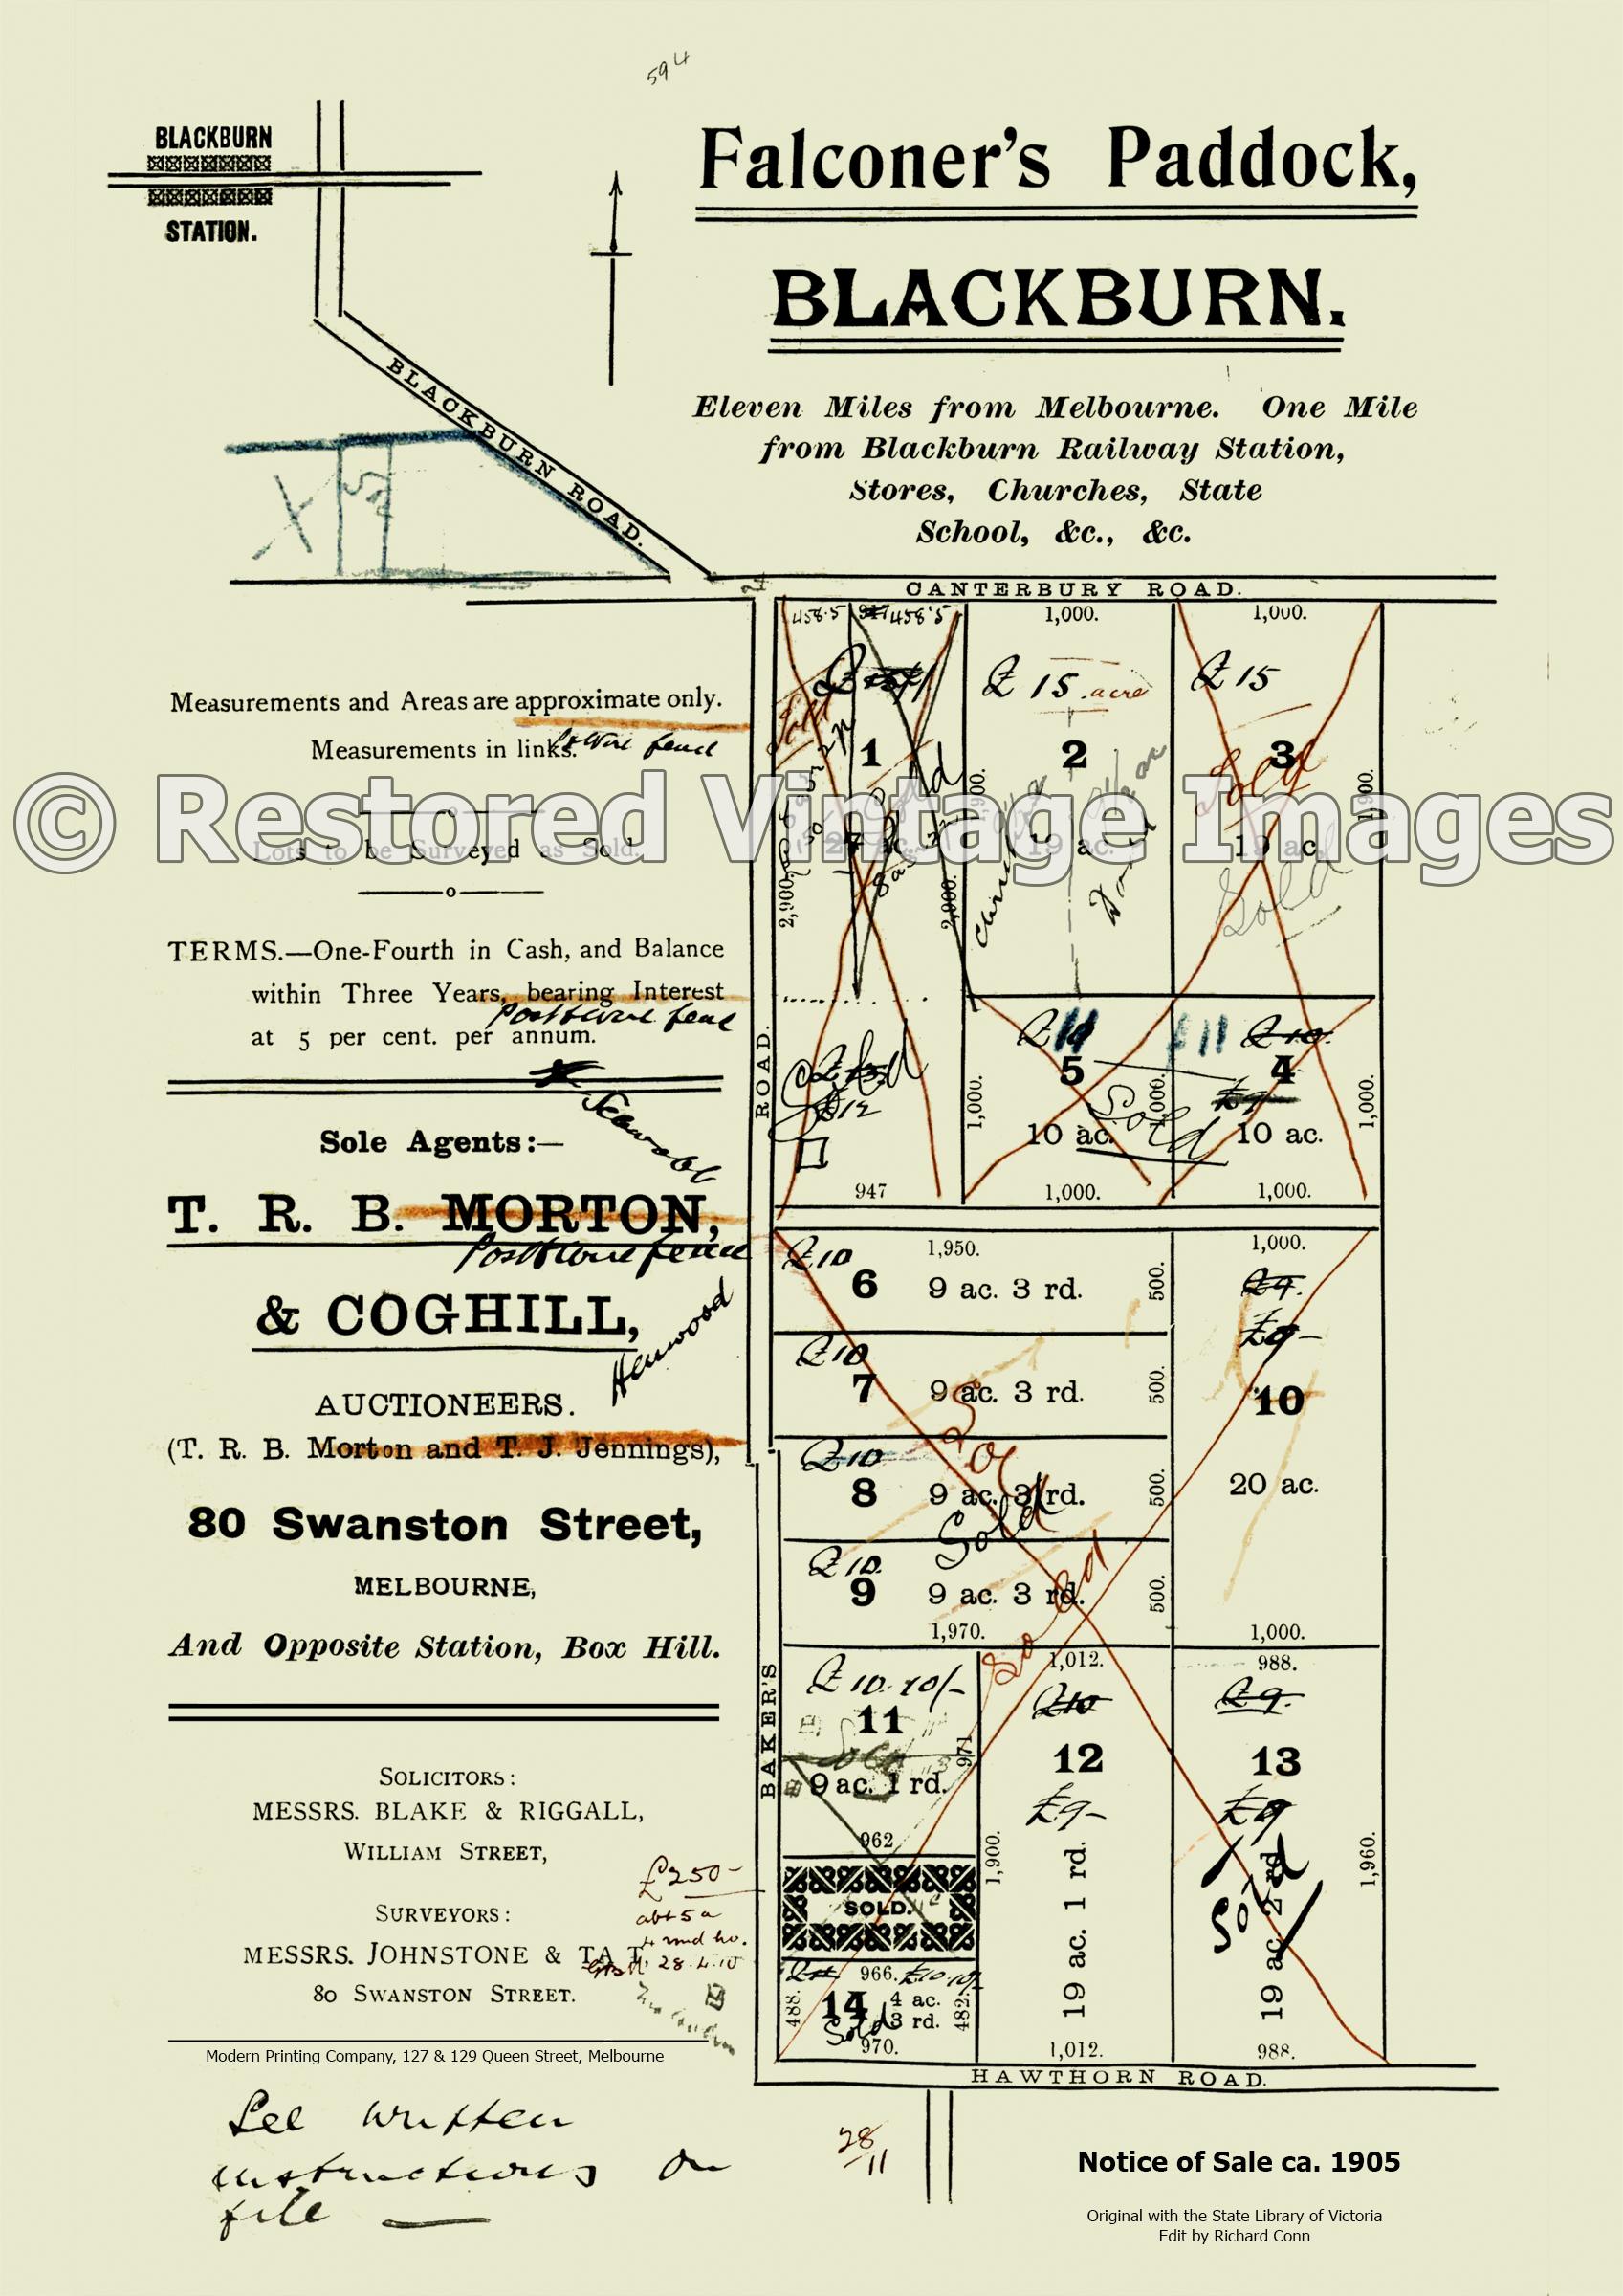 Falconer's Paddock 1905 – Blackburn South